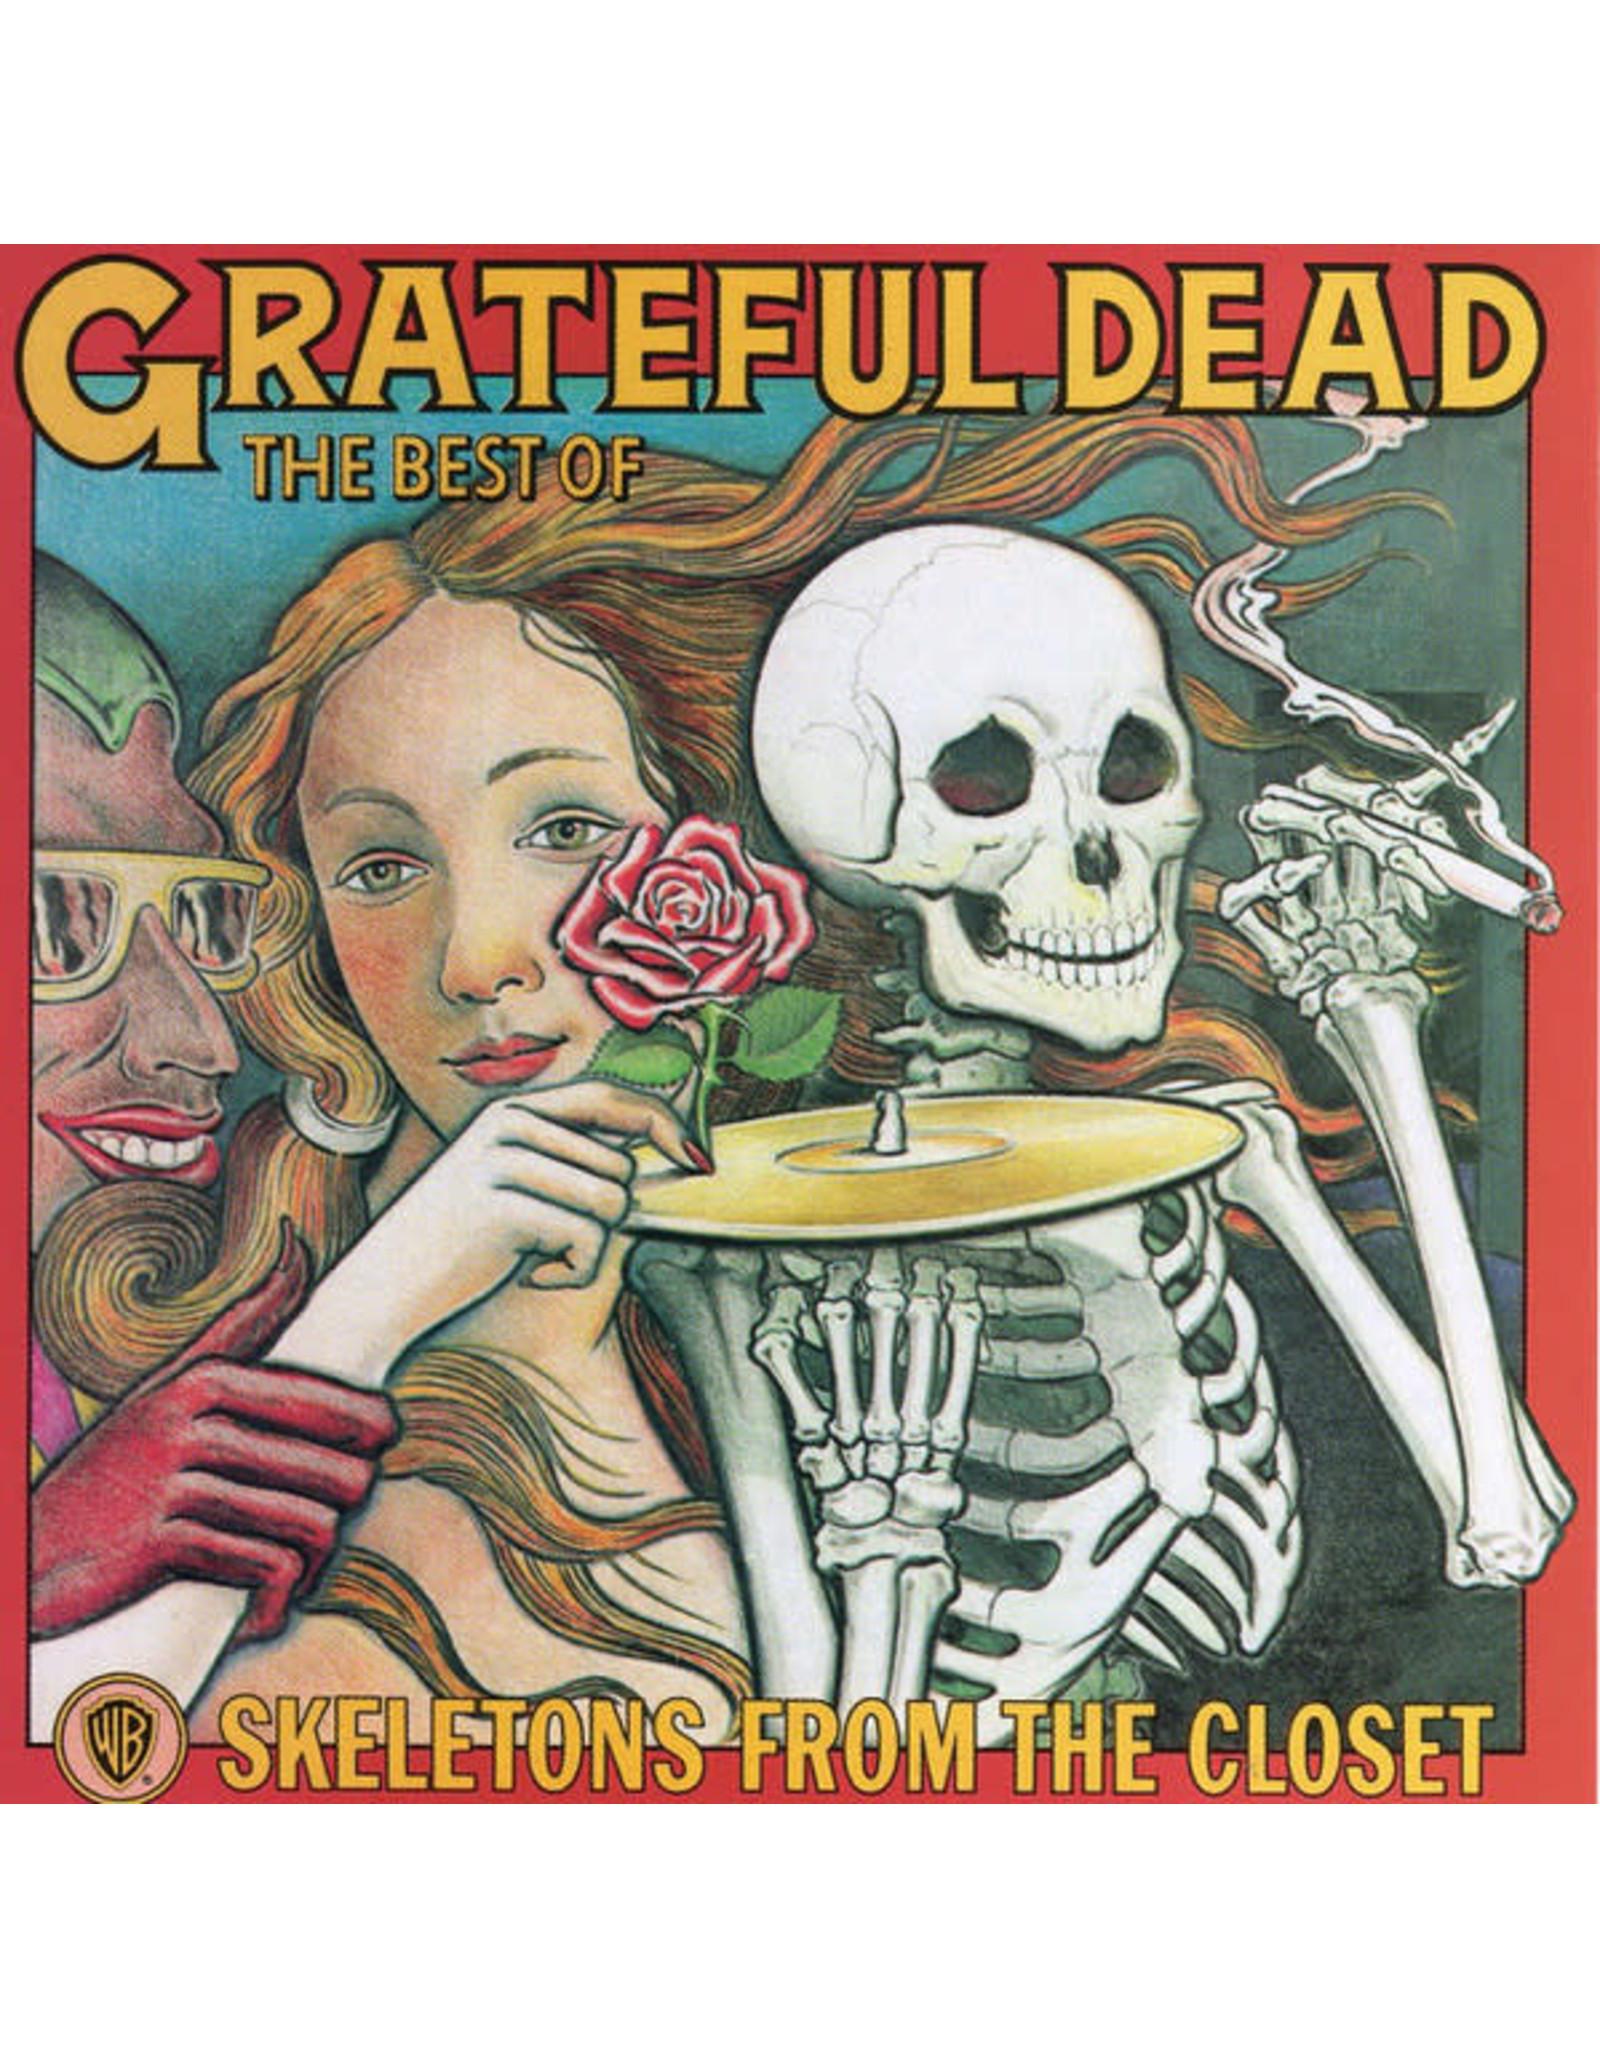 Grateful Dead - Skeletons From the Closet: the best of Grateful Dead LP